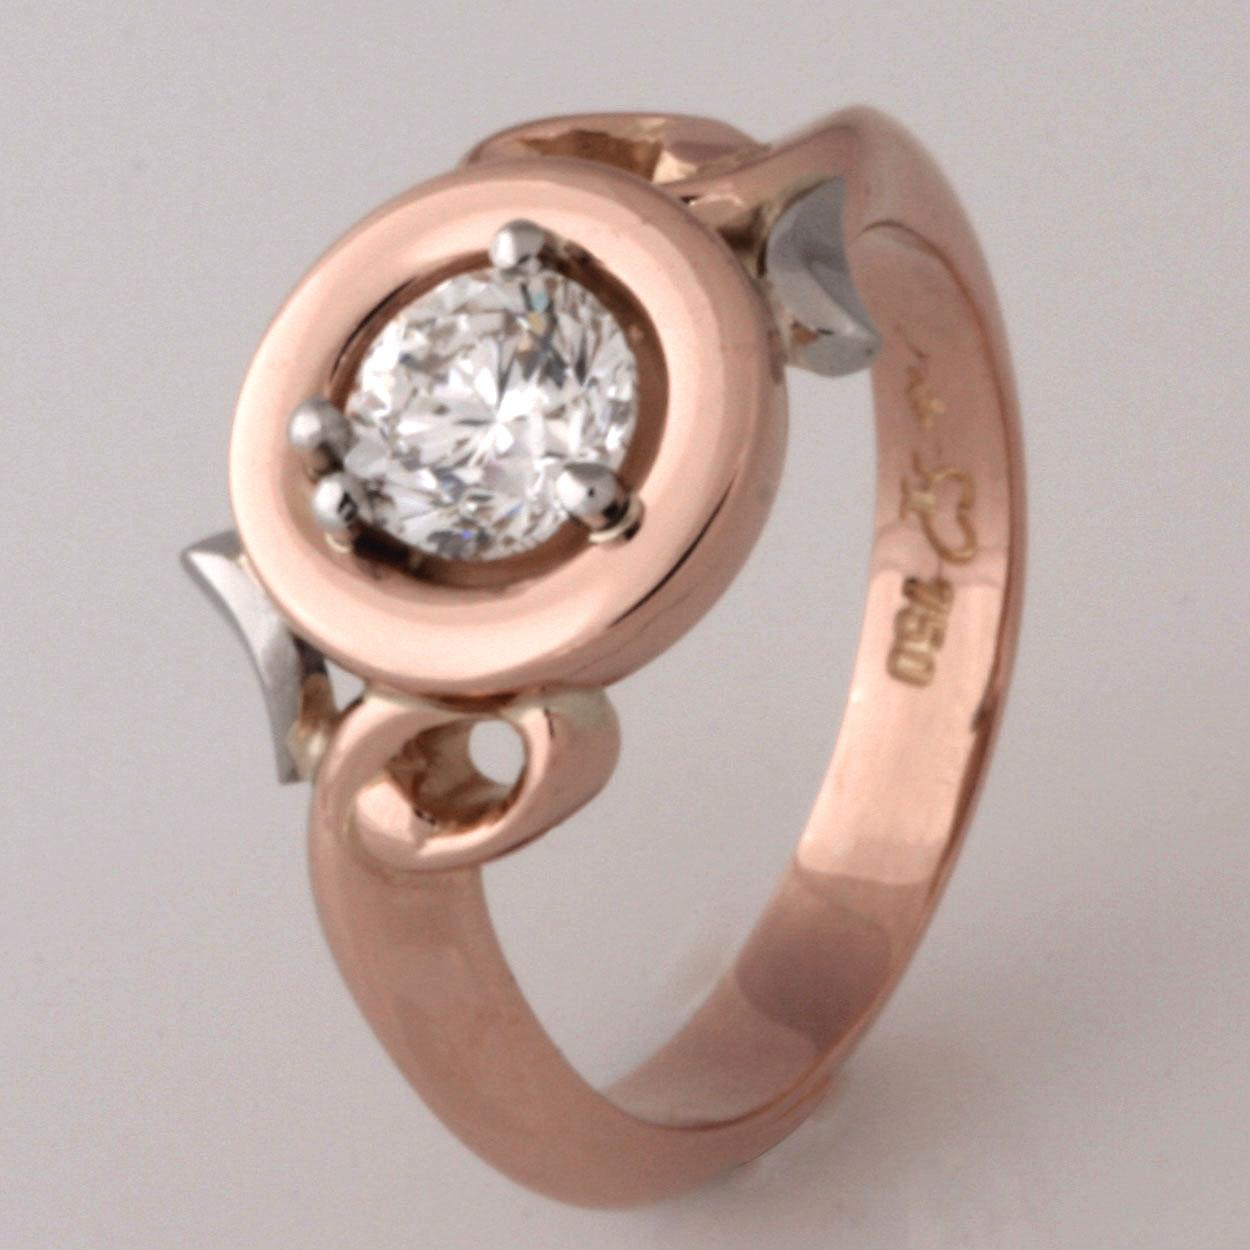 Handmade ladies 18ct rose gold and platinum diamond ring